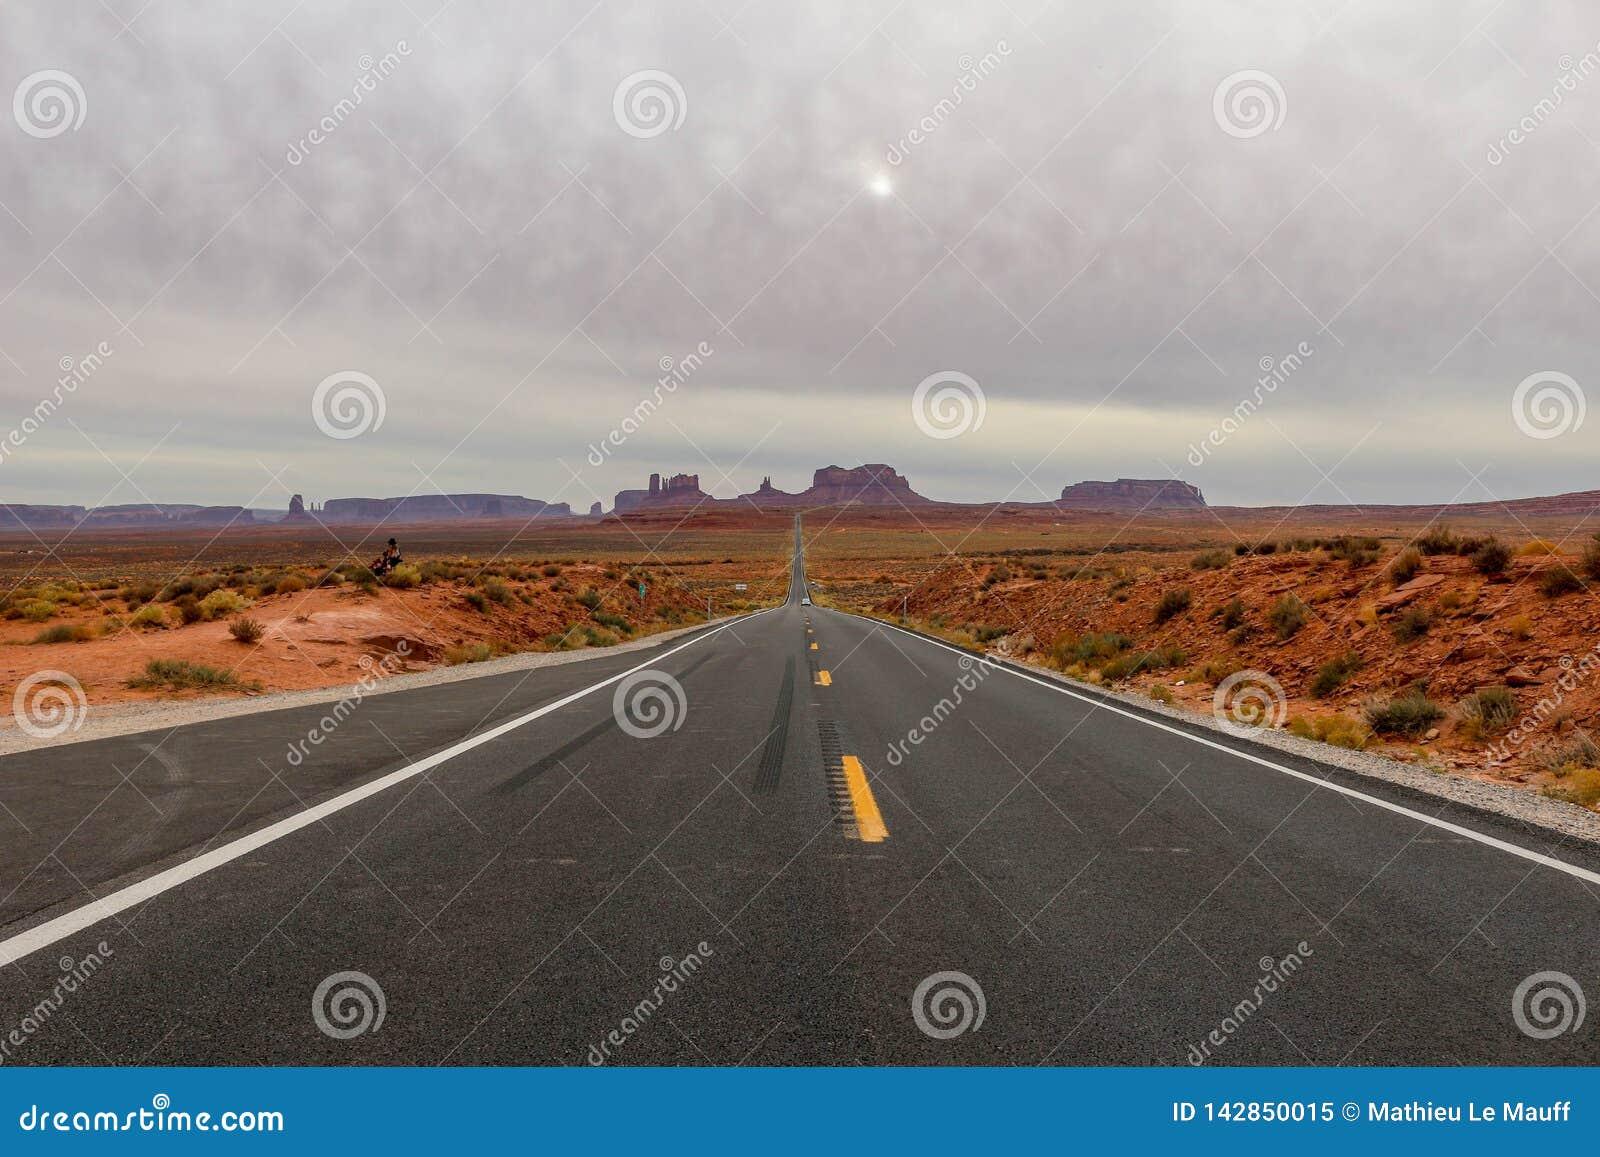 Tom rak väg som leder till monumentdalen, Utah som är bekant som Forrest Gump Point